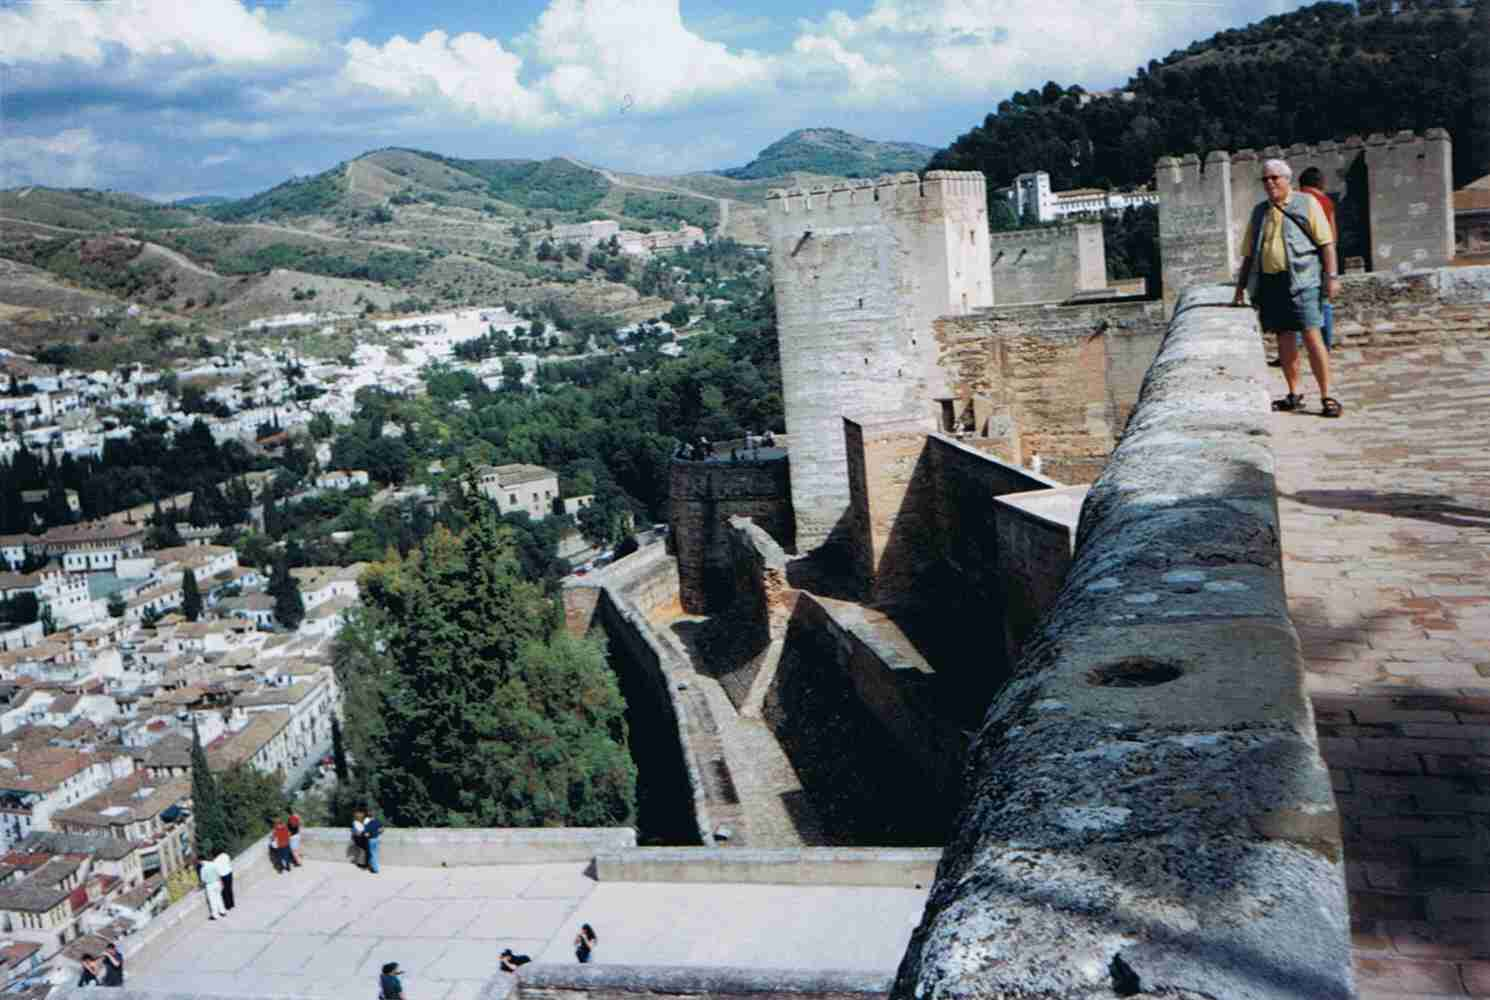 Alhambra, Albaicin, Sacramonte